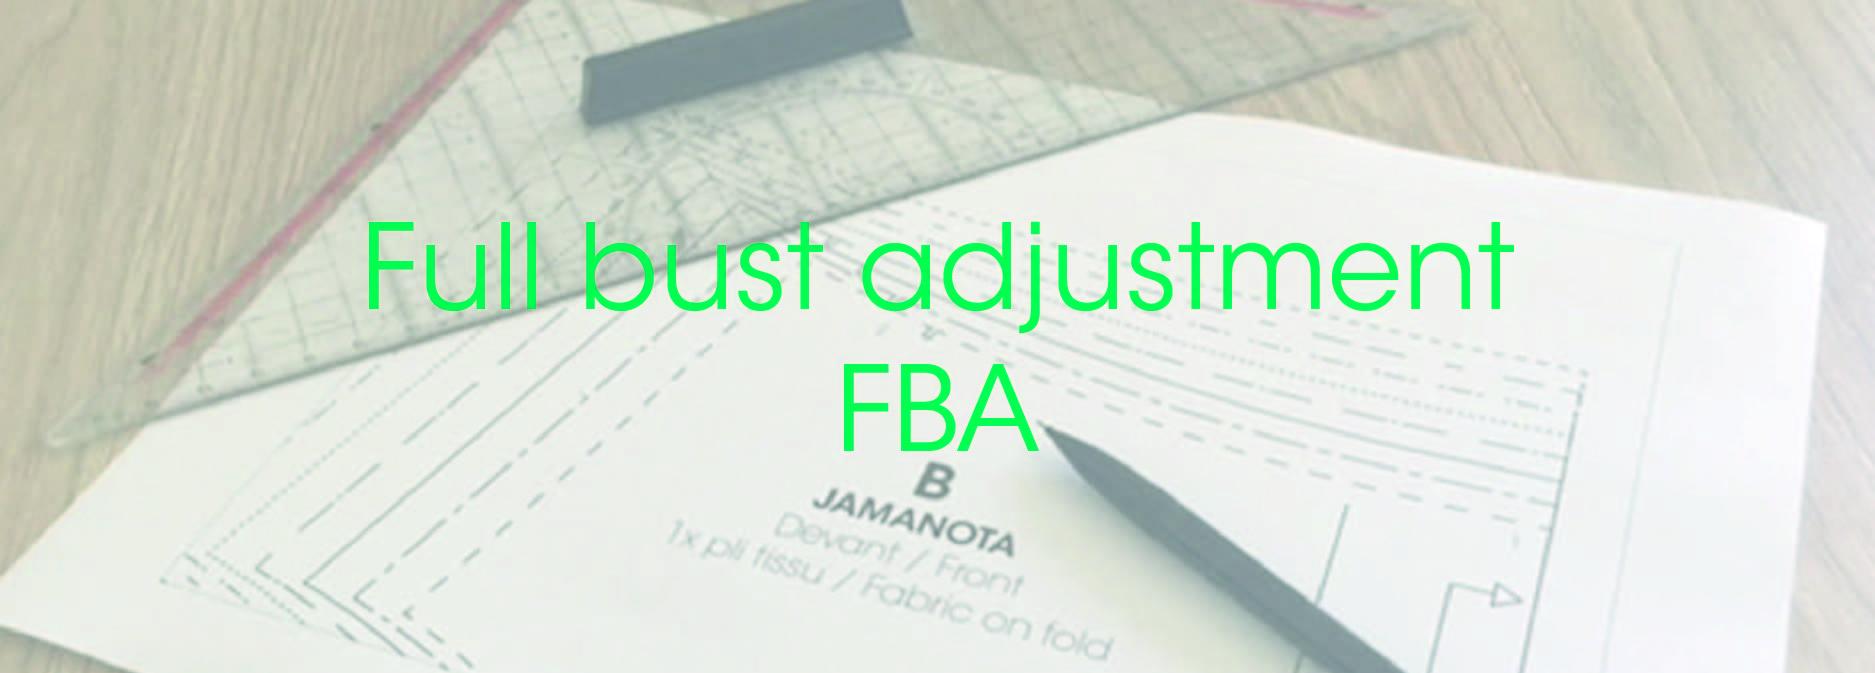 Pattern_making_full-bust_adjustment